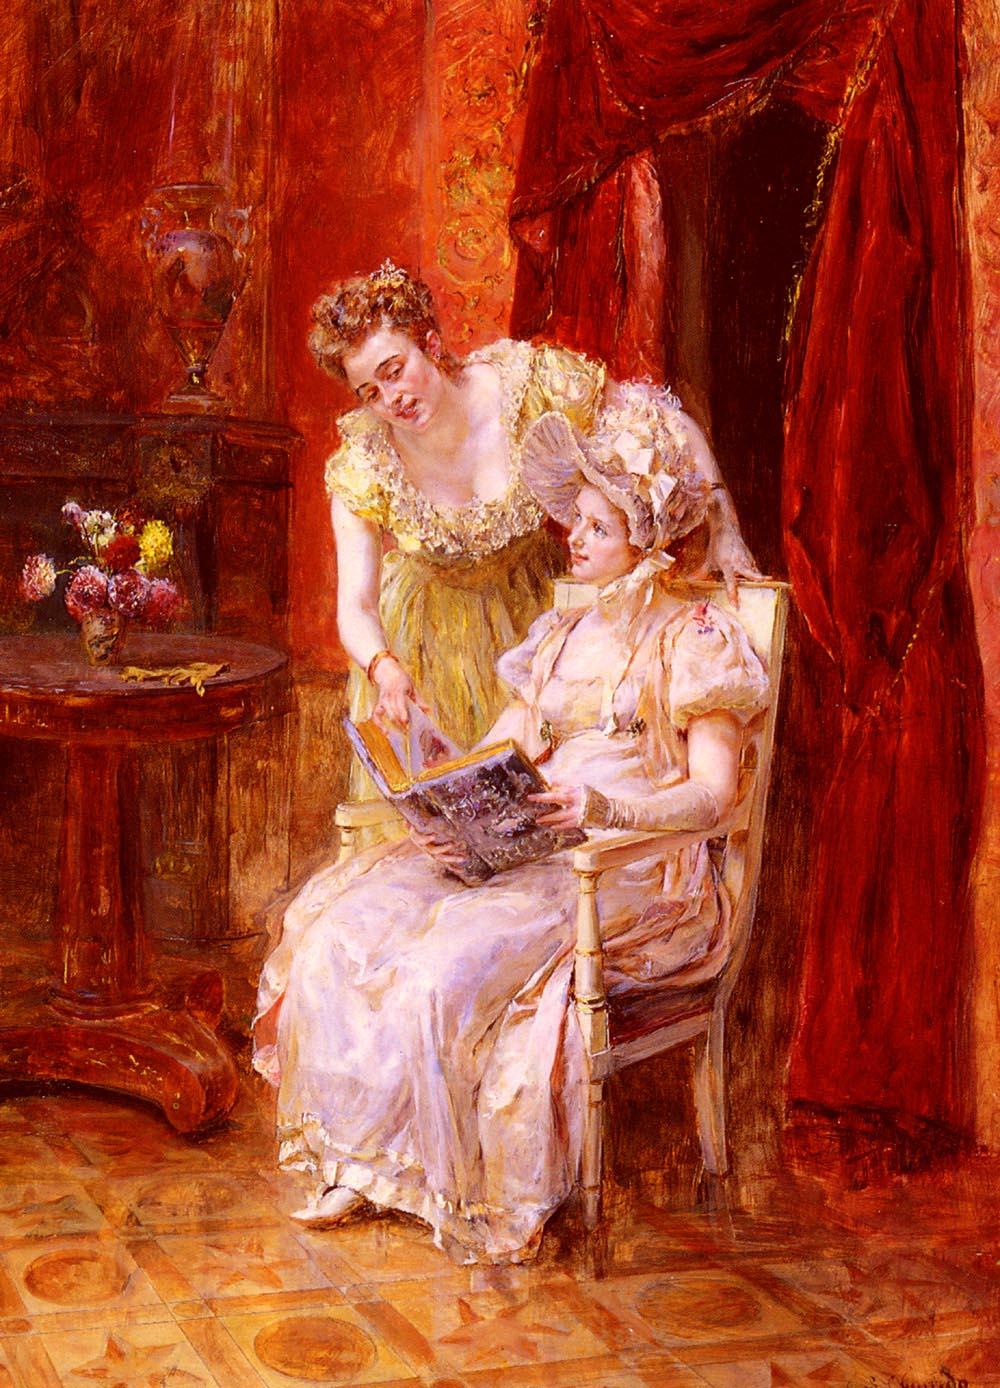 The Sketchbook | Eduardo Leon Garrido | Oil Painting